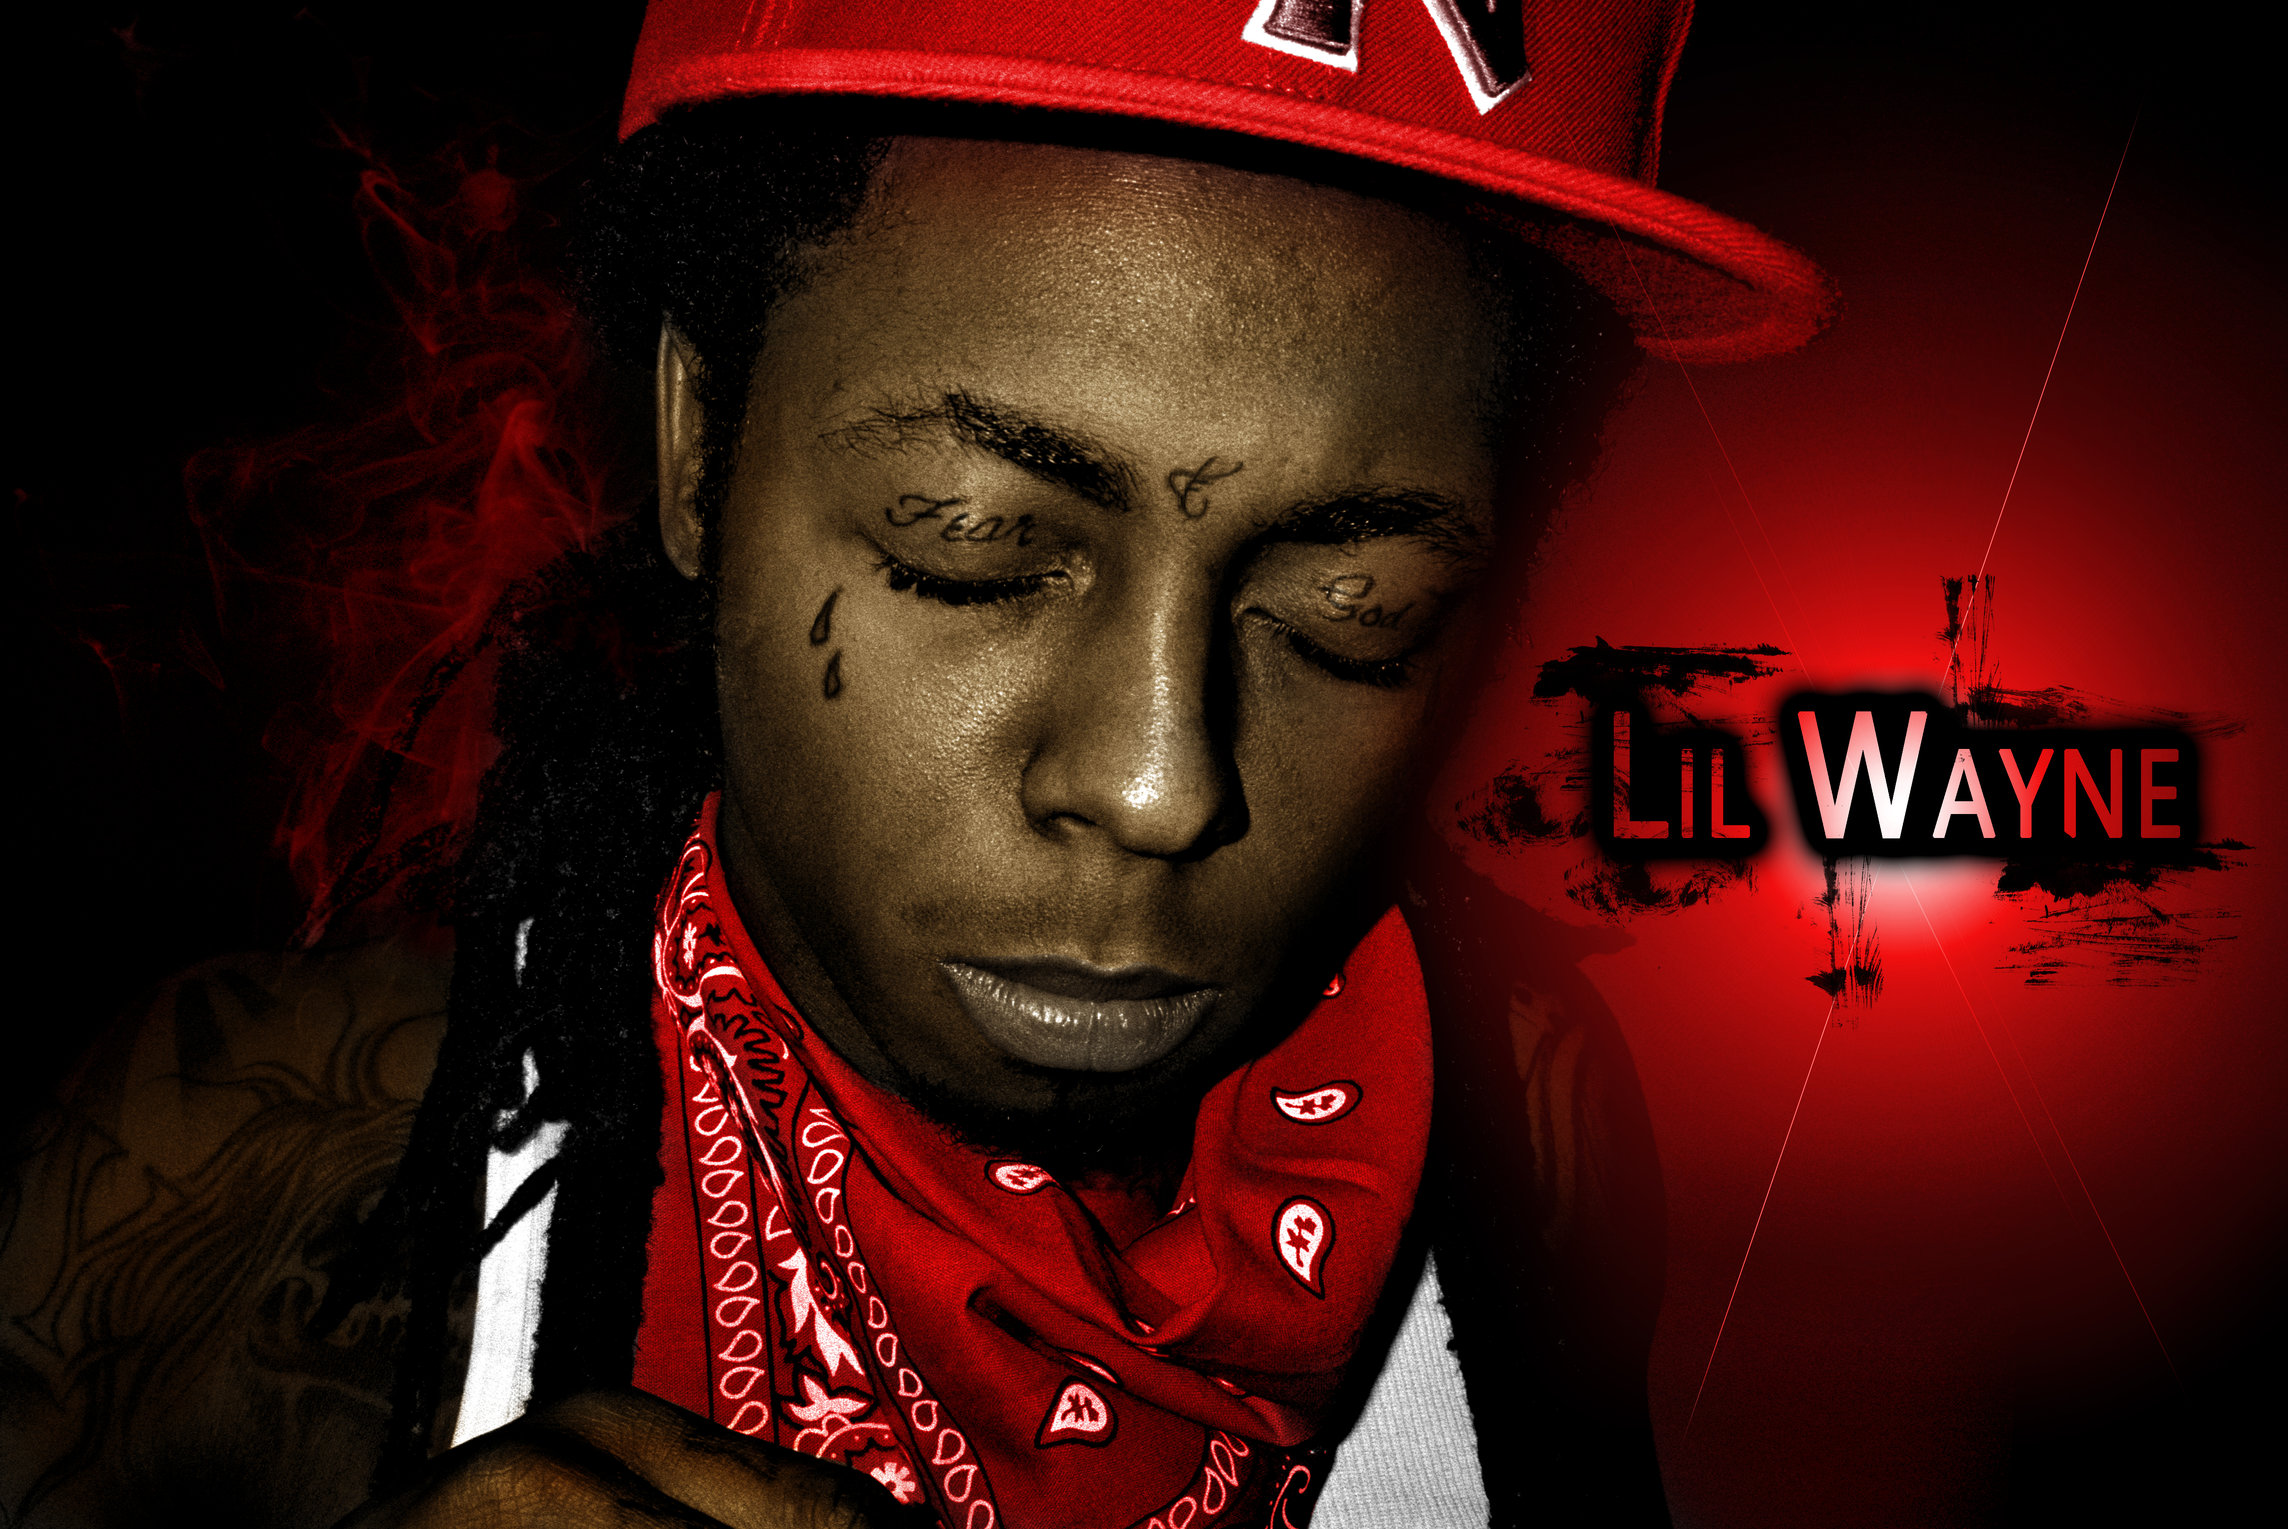 Lil' Wayne Photos, News and Videos | Just Jared